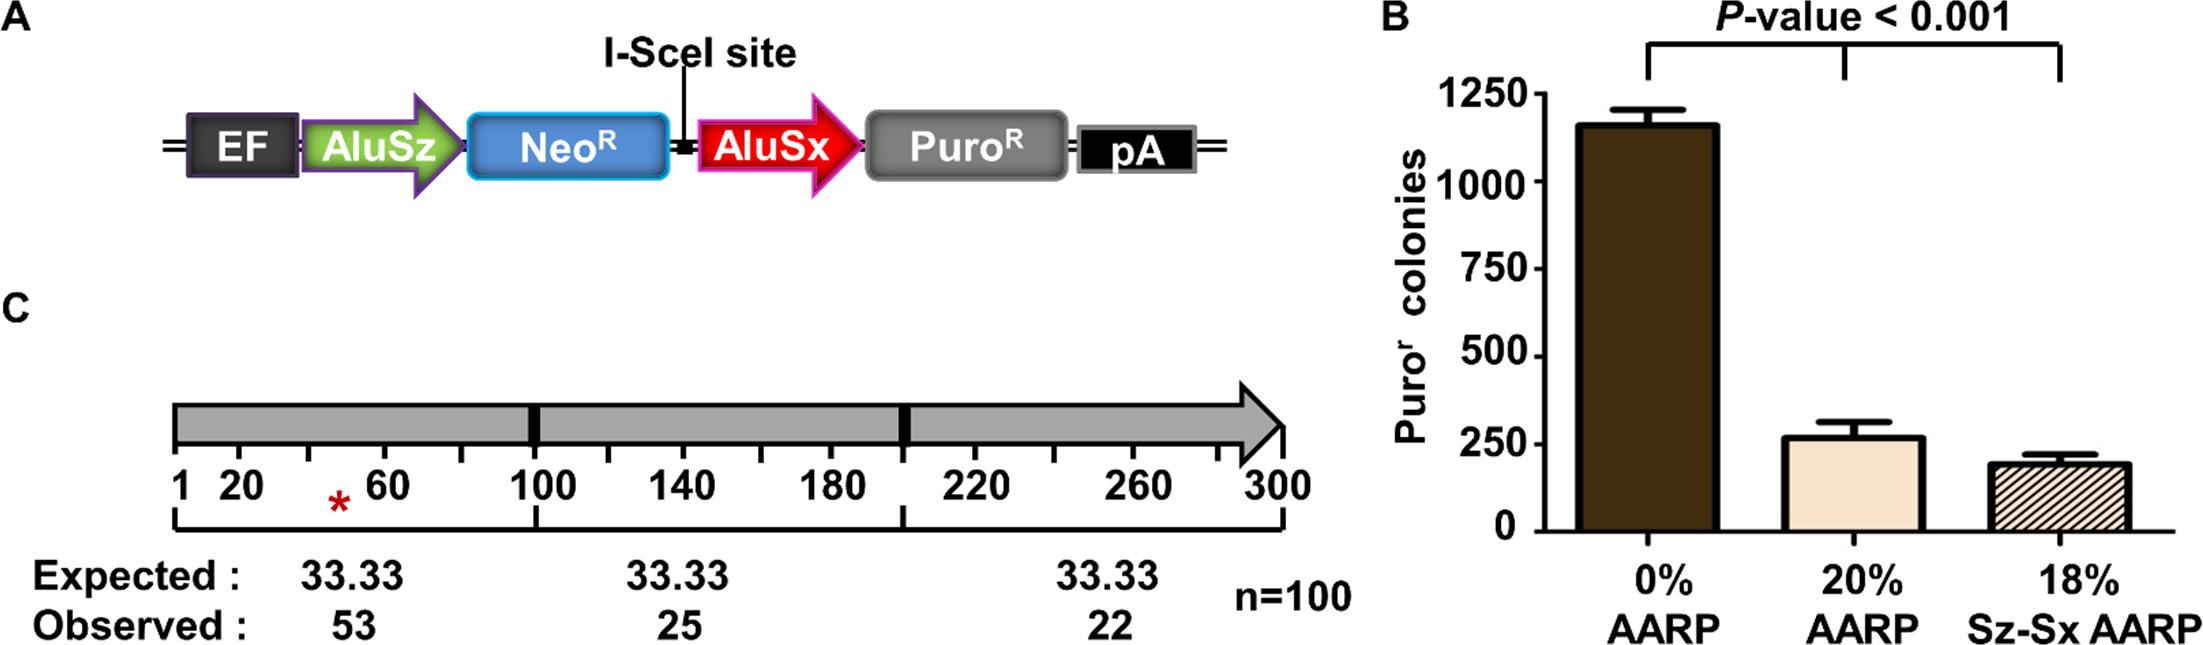 Alu/Alu recombination of disease-causing genomic Alu elements.